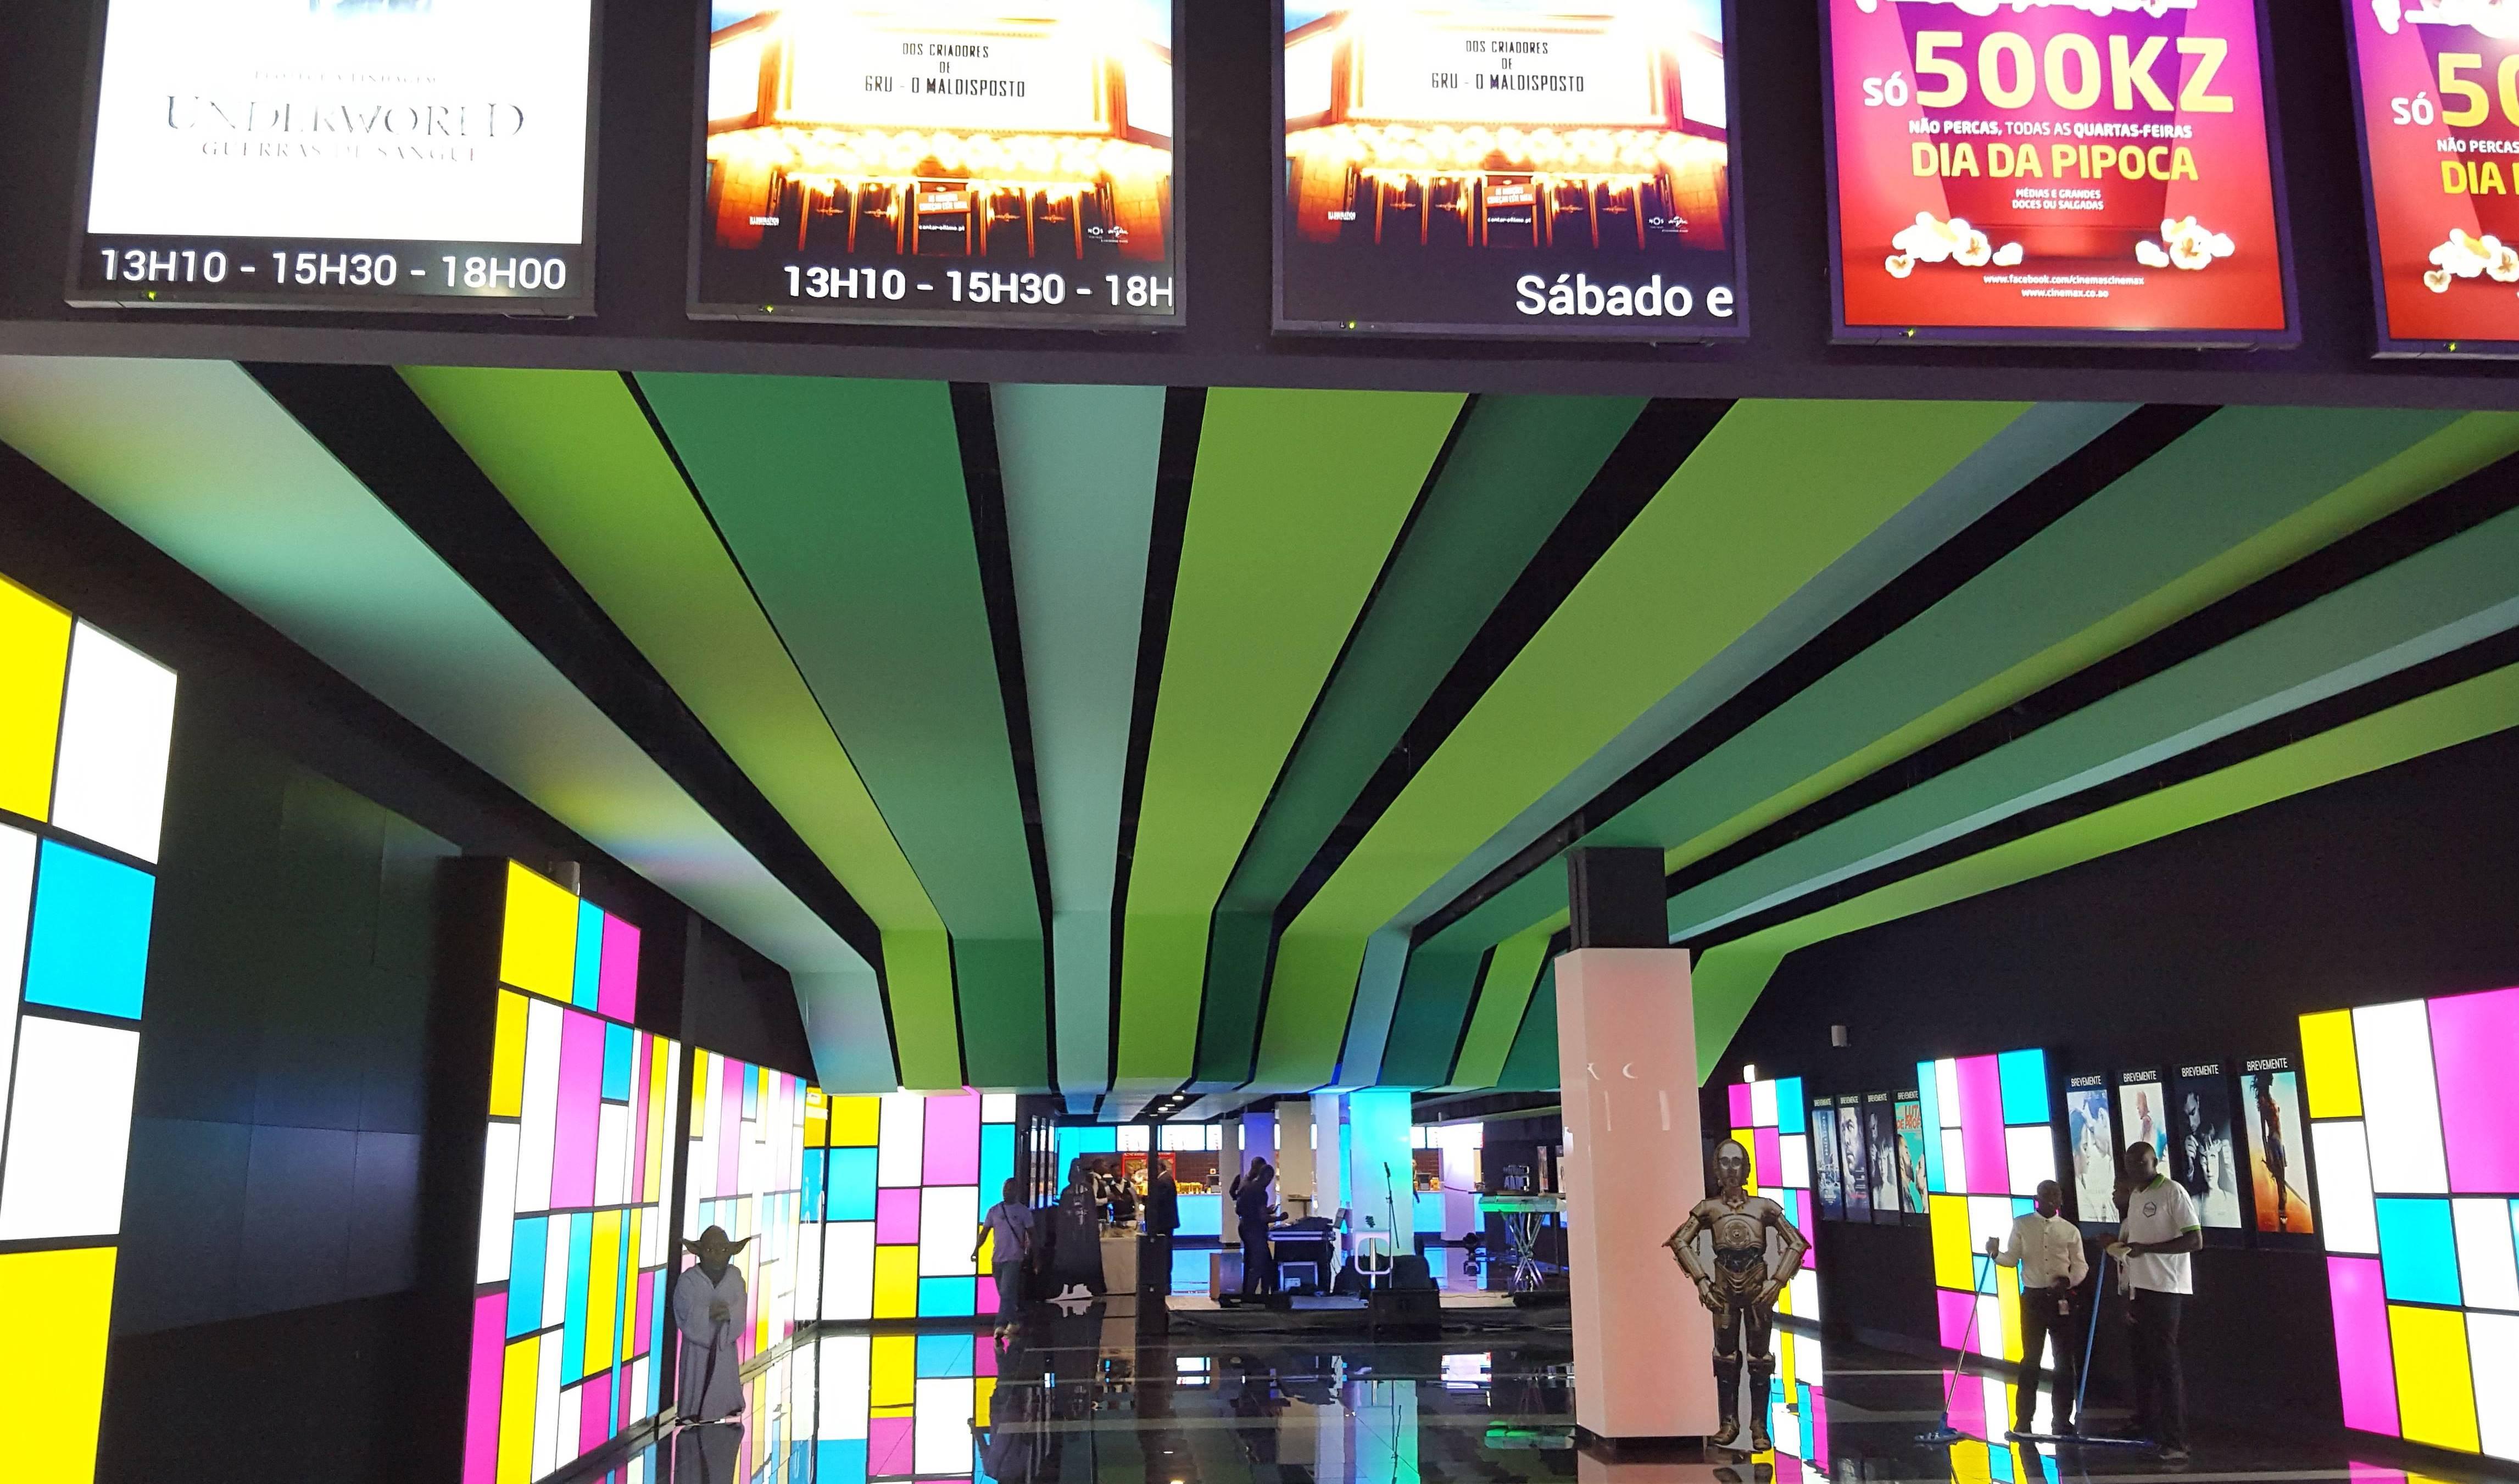 Resultado de imagem para Cinemax talatona